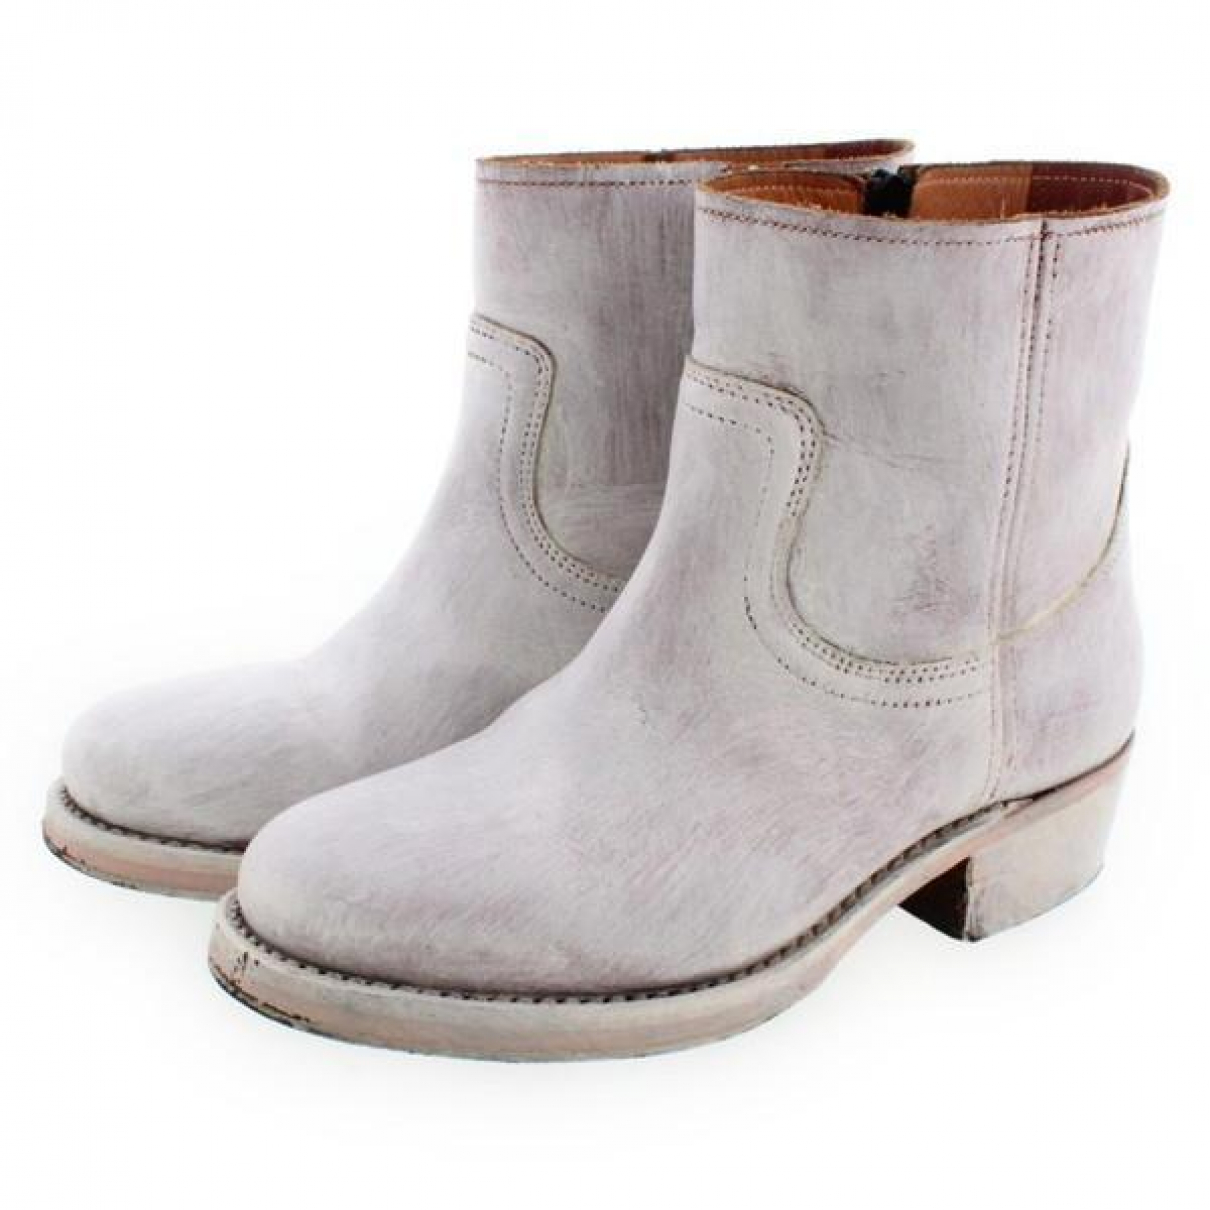 Maison Martin Margiela N White Leather Ankle boots for Women 37 EU